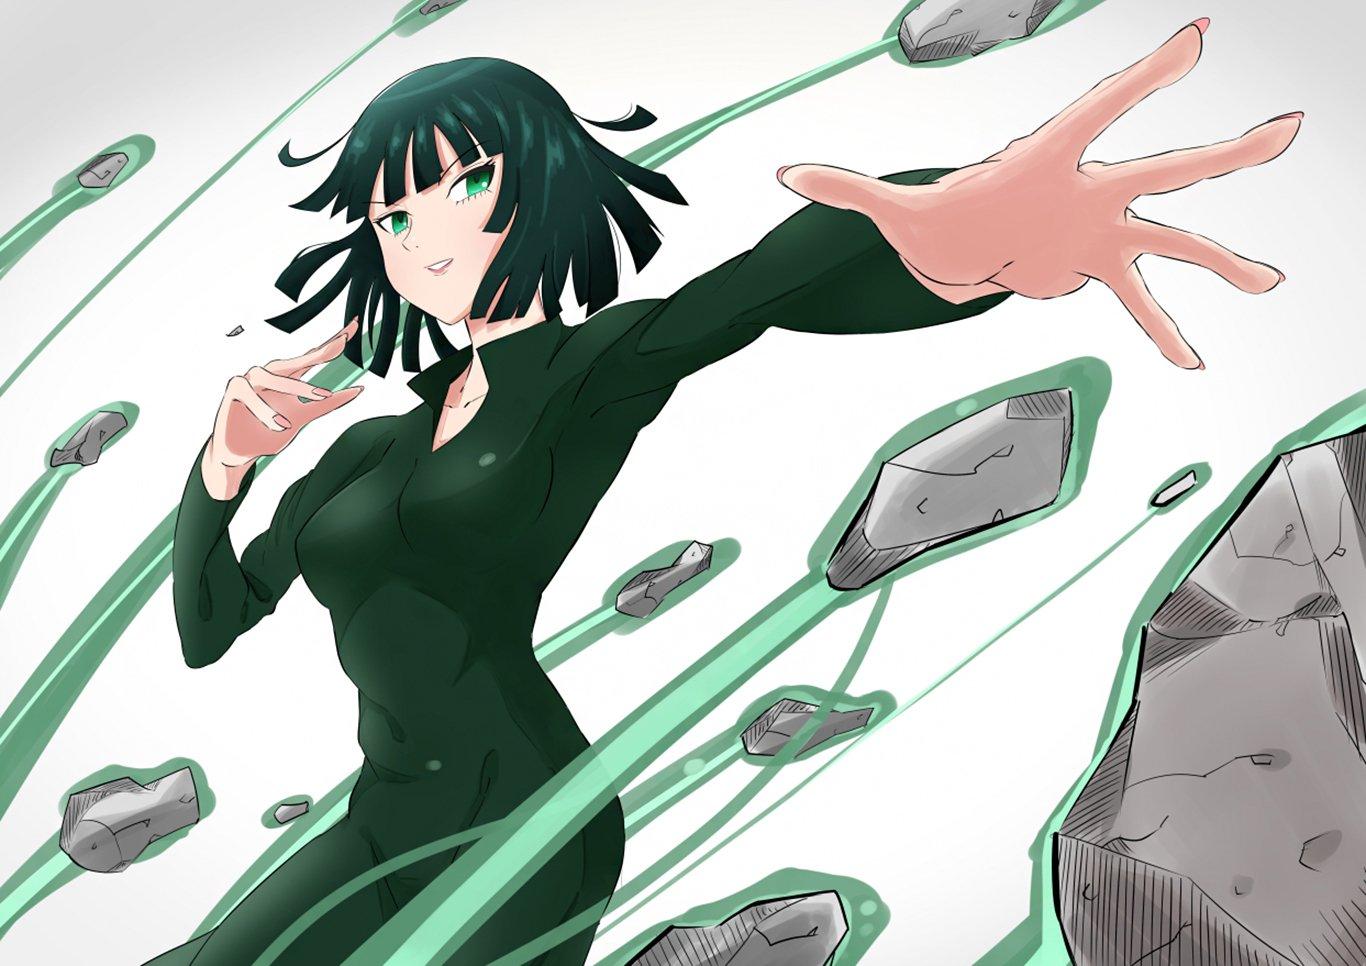 Fubuki Wallpaper And Background Image 1366x966 Id 657208